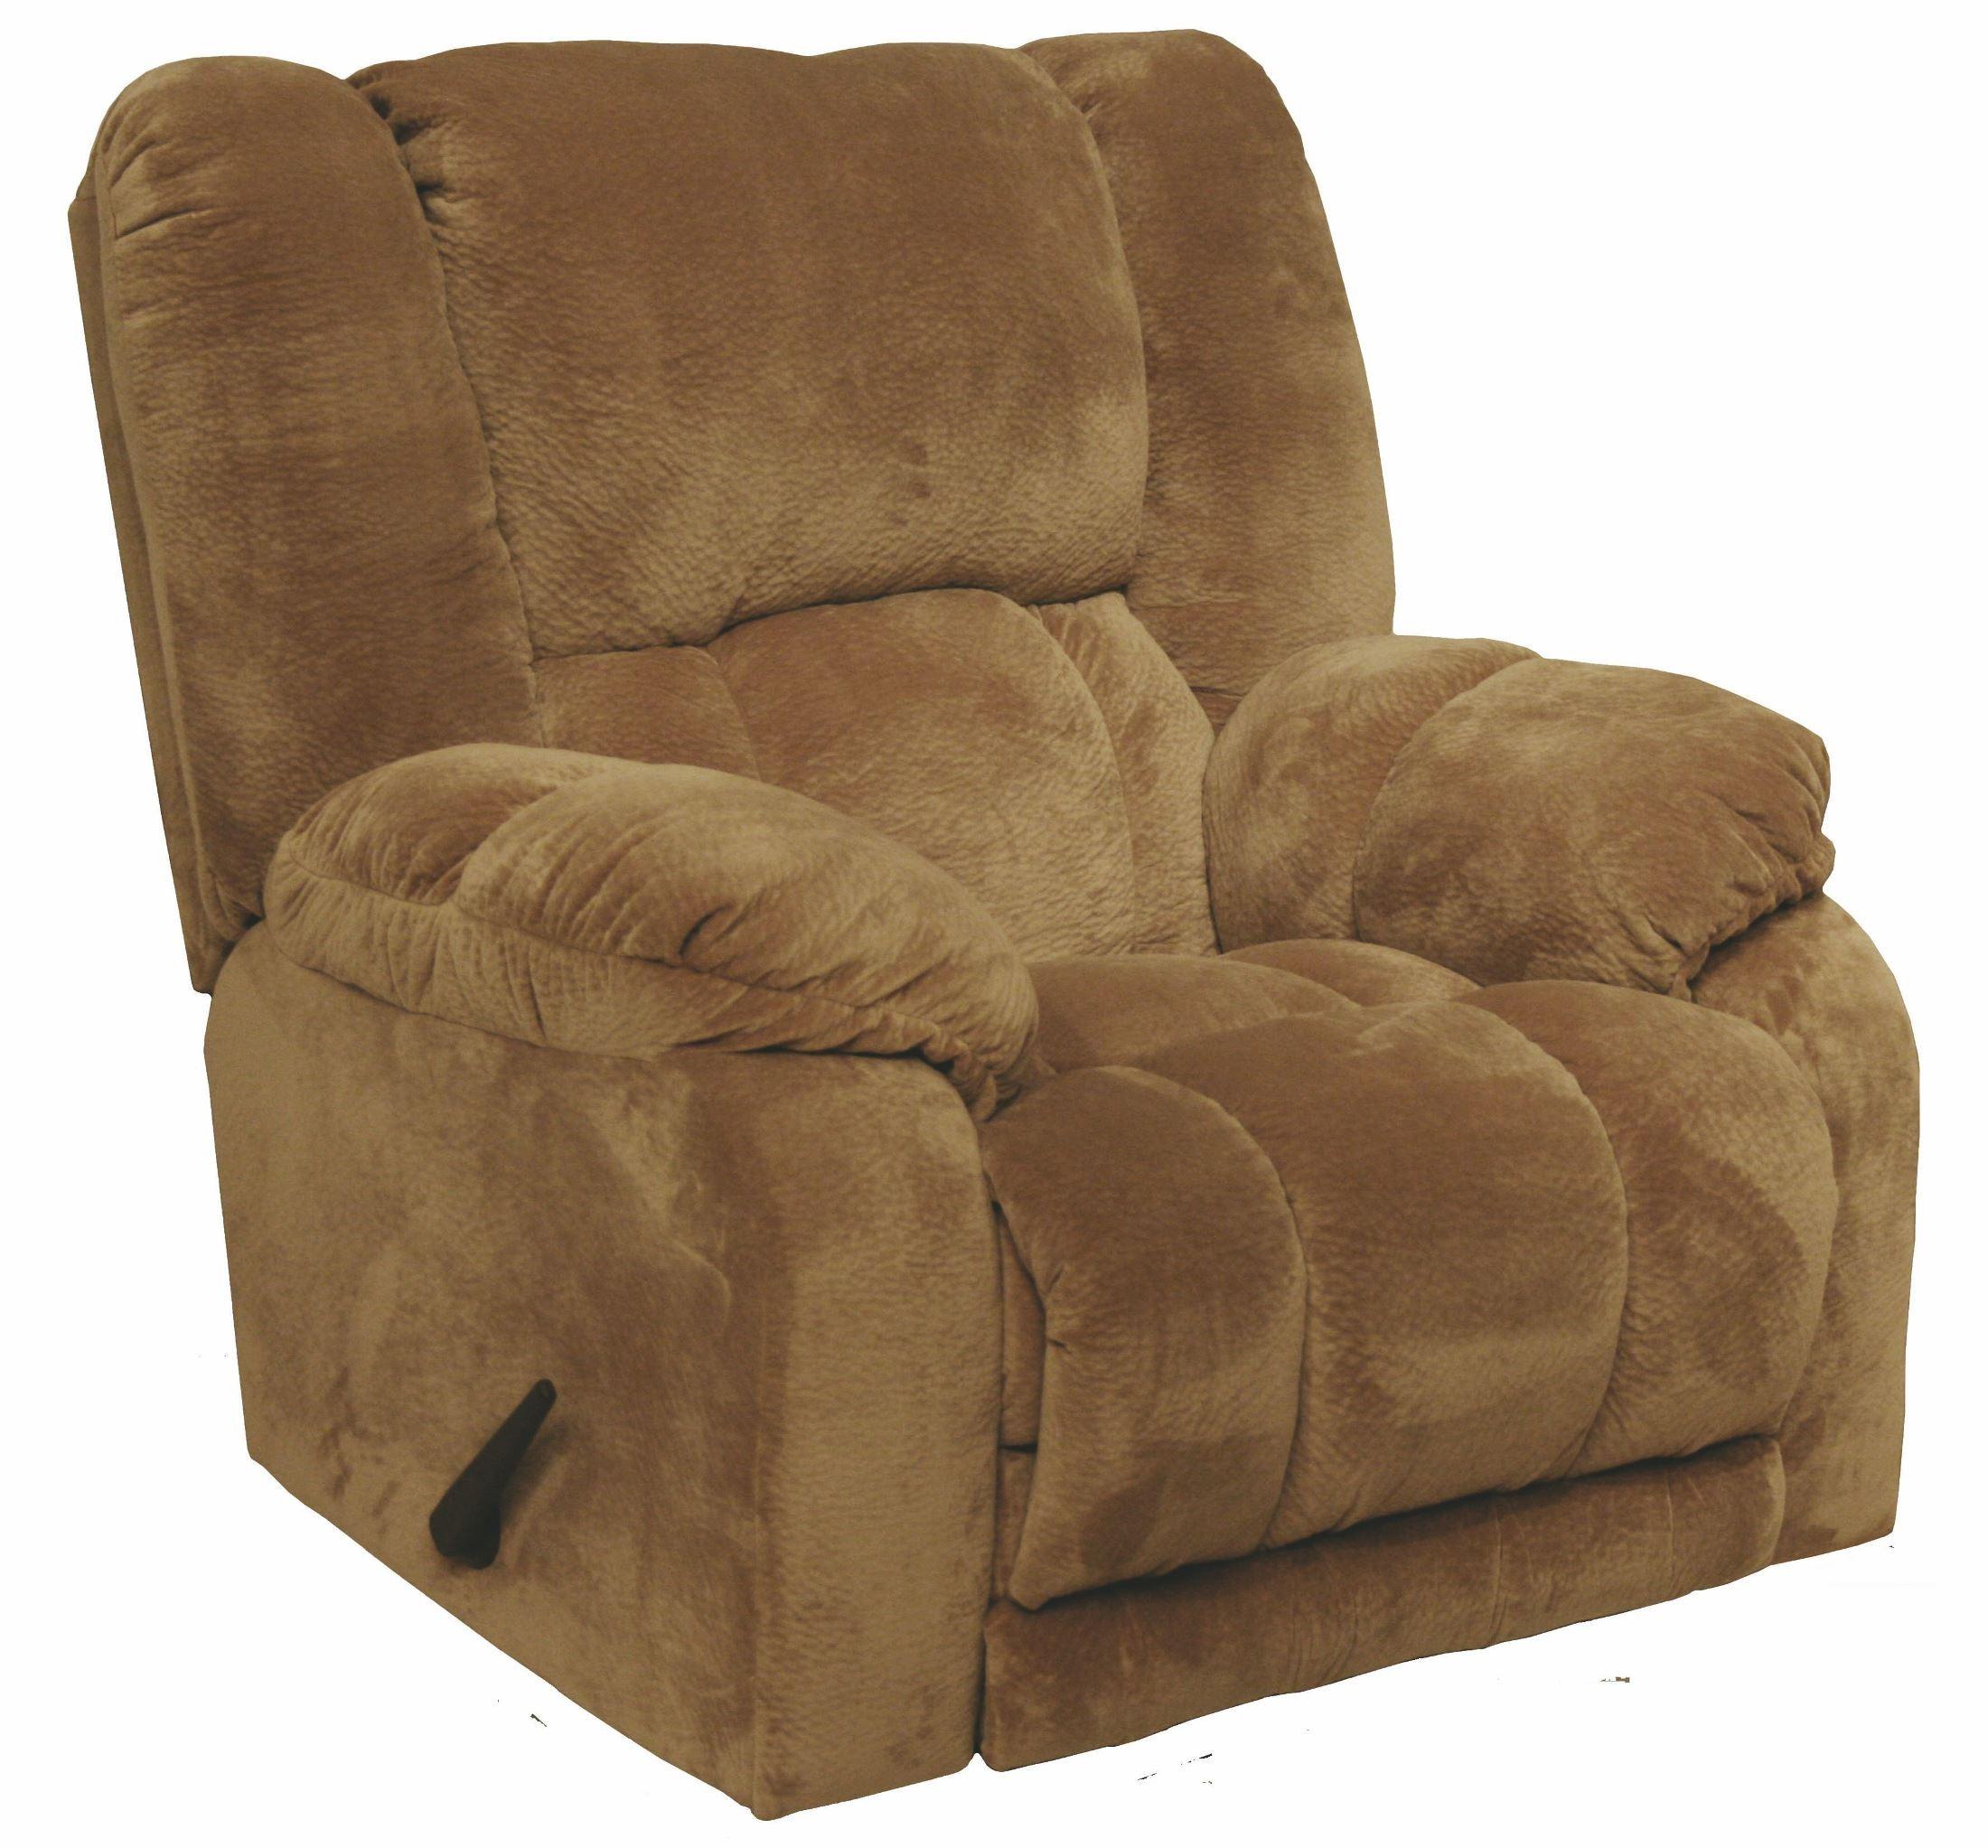 Hogan camel inch away recliner from catnapper 45424233436 for Catnapper cloud nine chaise recliner